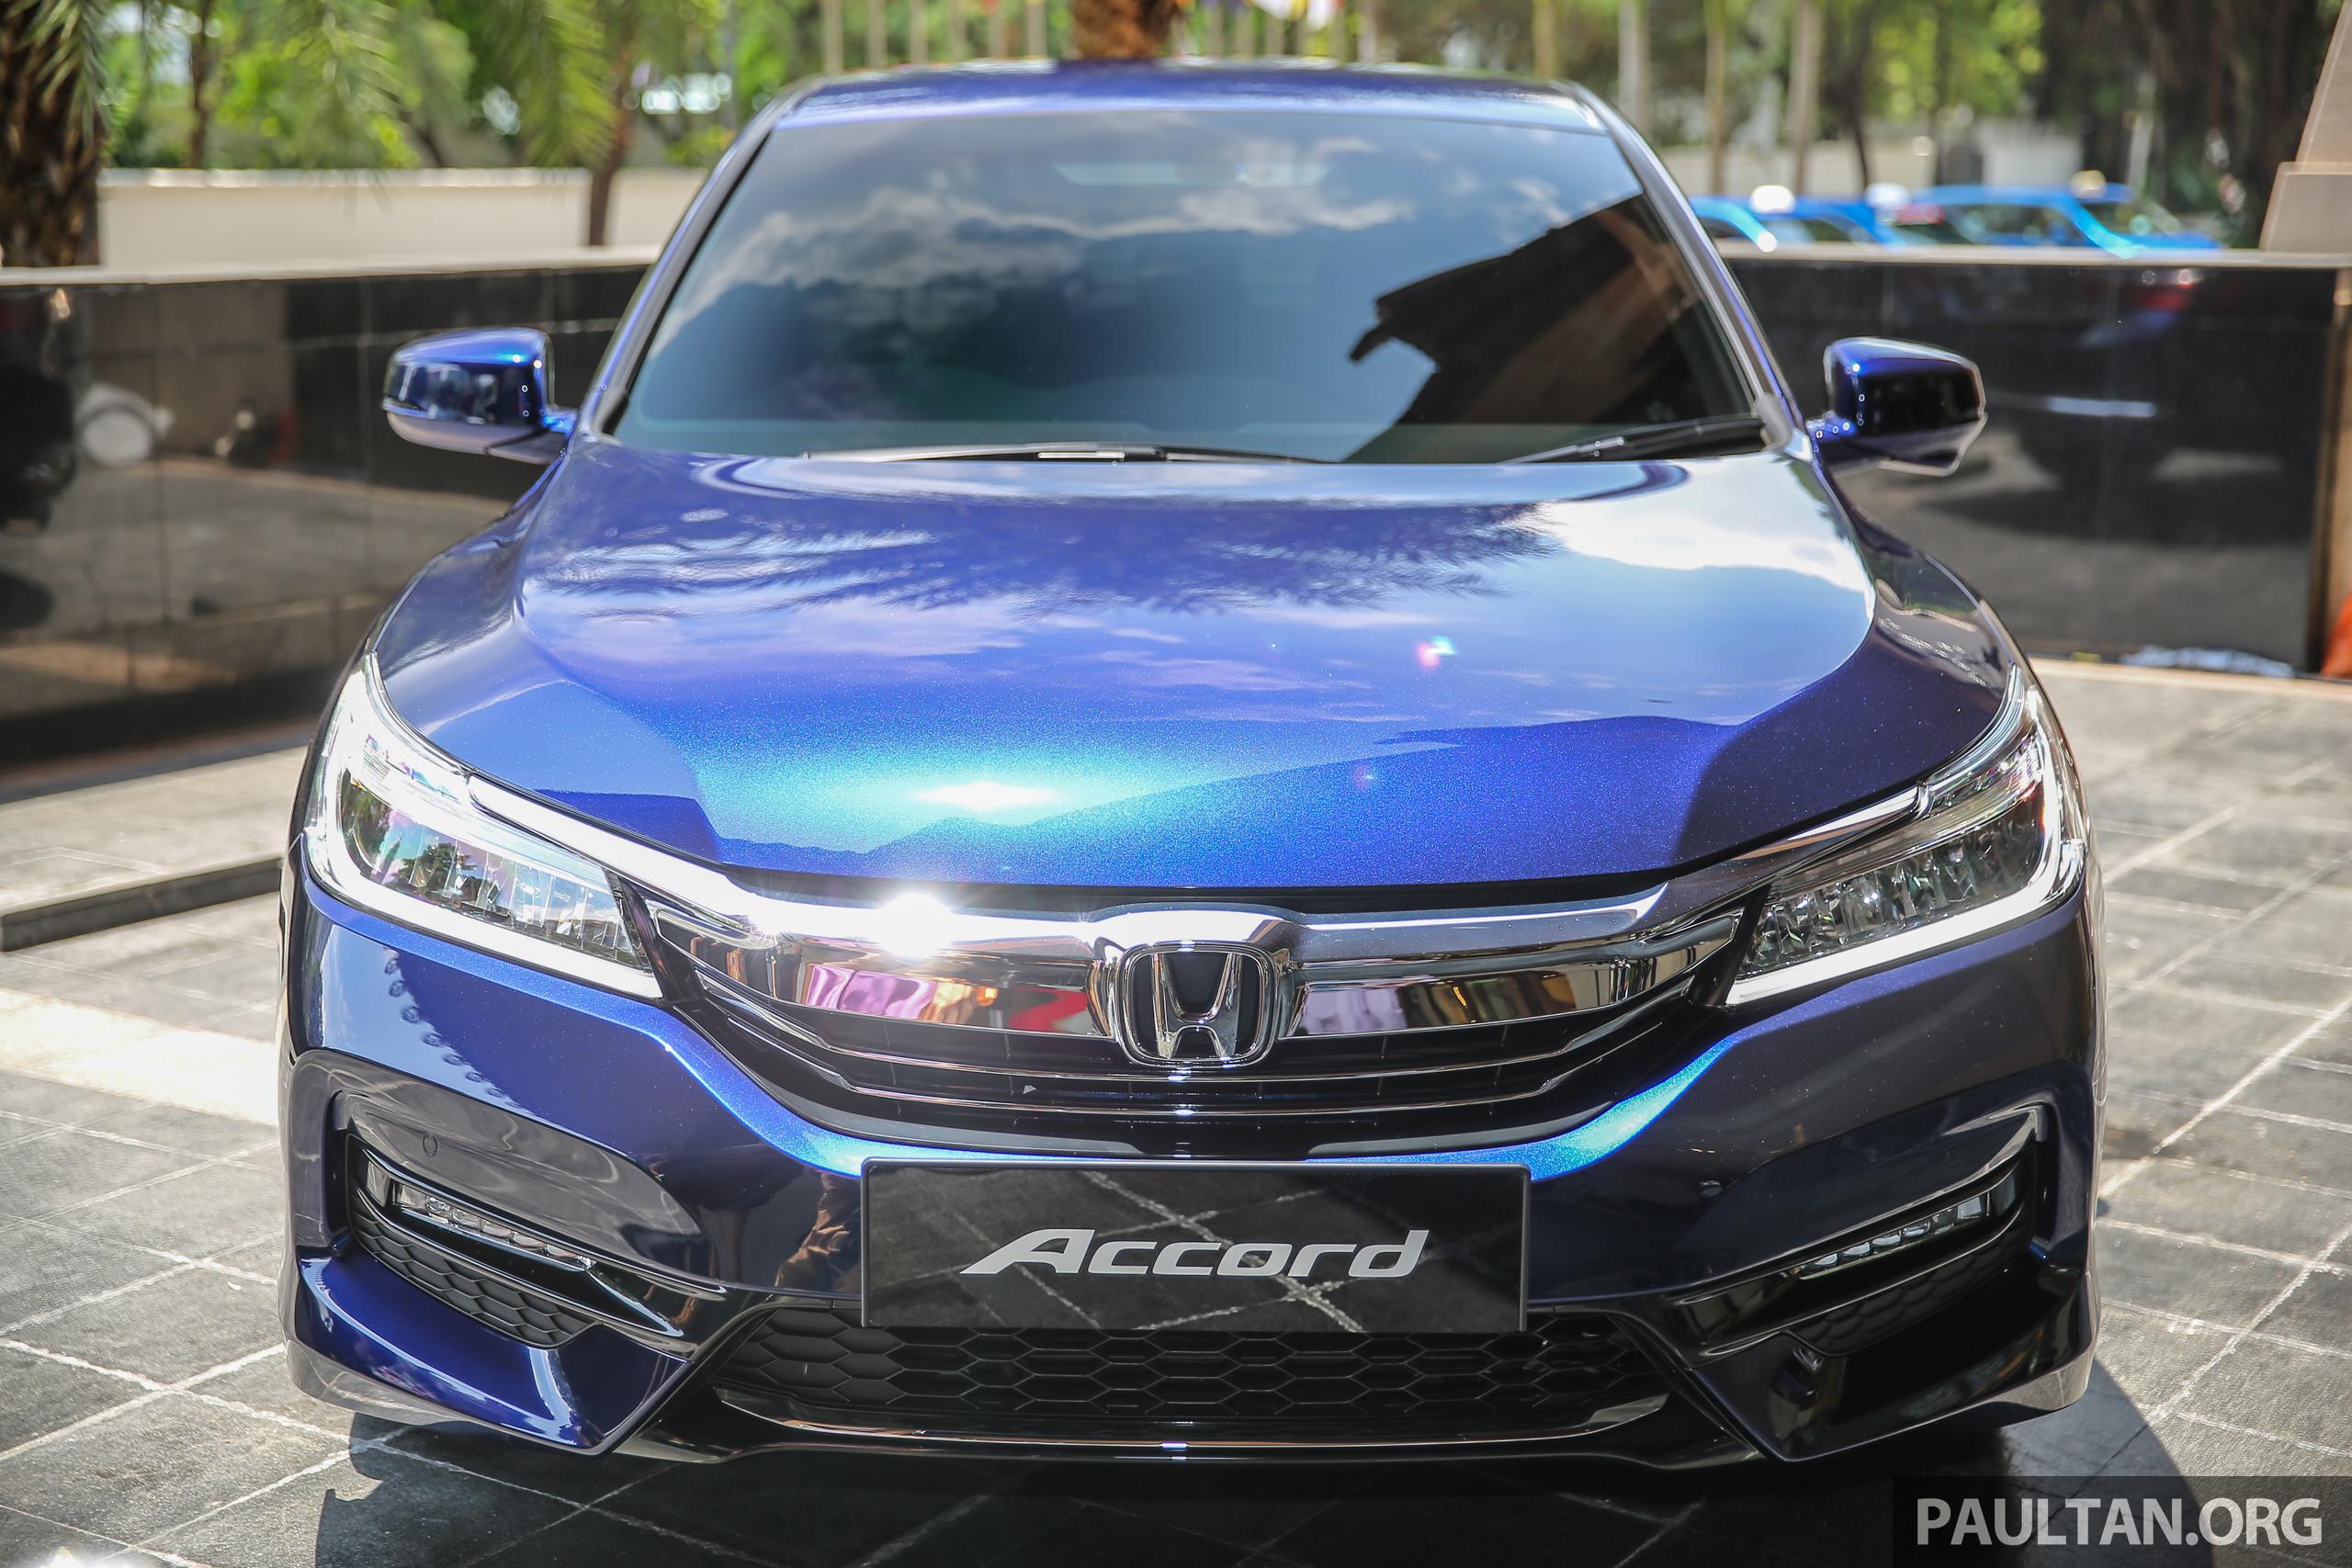 Honda accord 2 4 vti l 2016 diprebiu di malaysia image 529171 for Honda accord 2 4